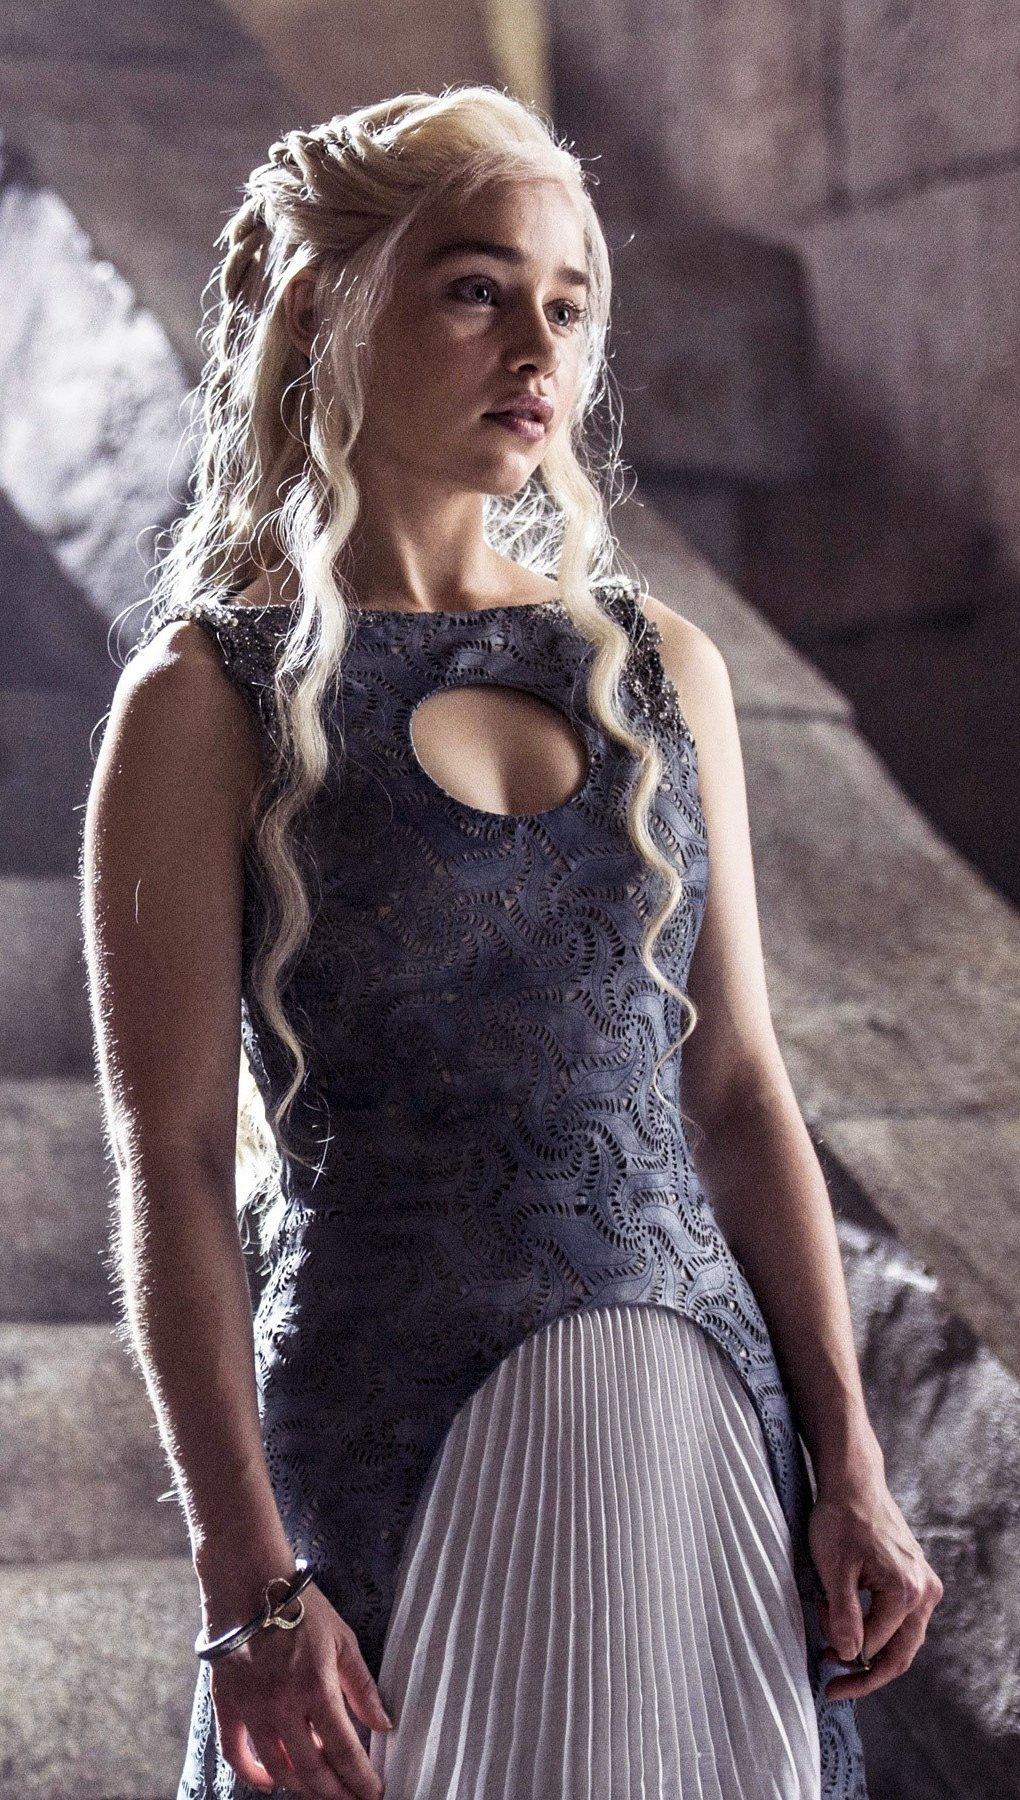 Wallpaper Daenerys Targaryen in Season 4 Vertical